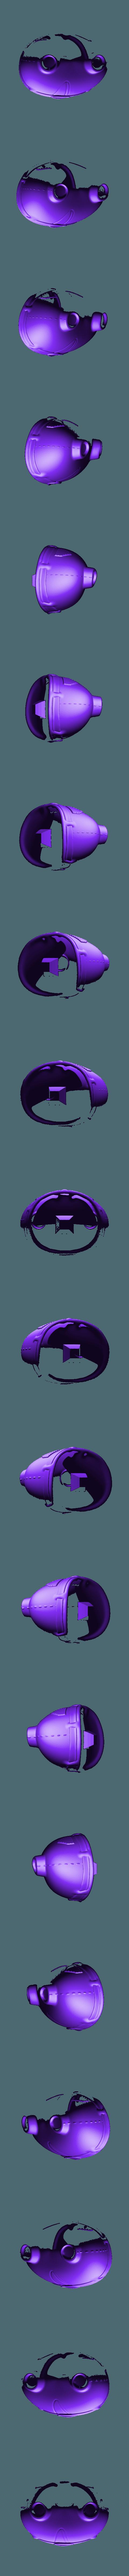 M.Krabs - Bas.stl Download free STL file Mr. Krabs • 3D printable design, BODY3D